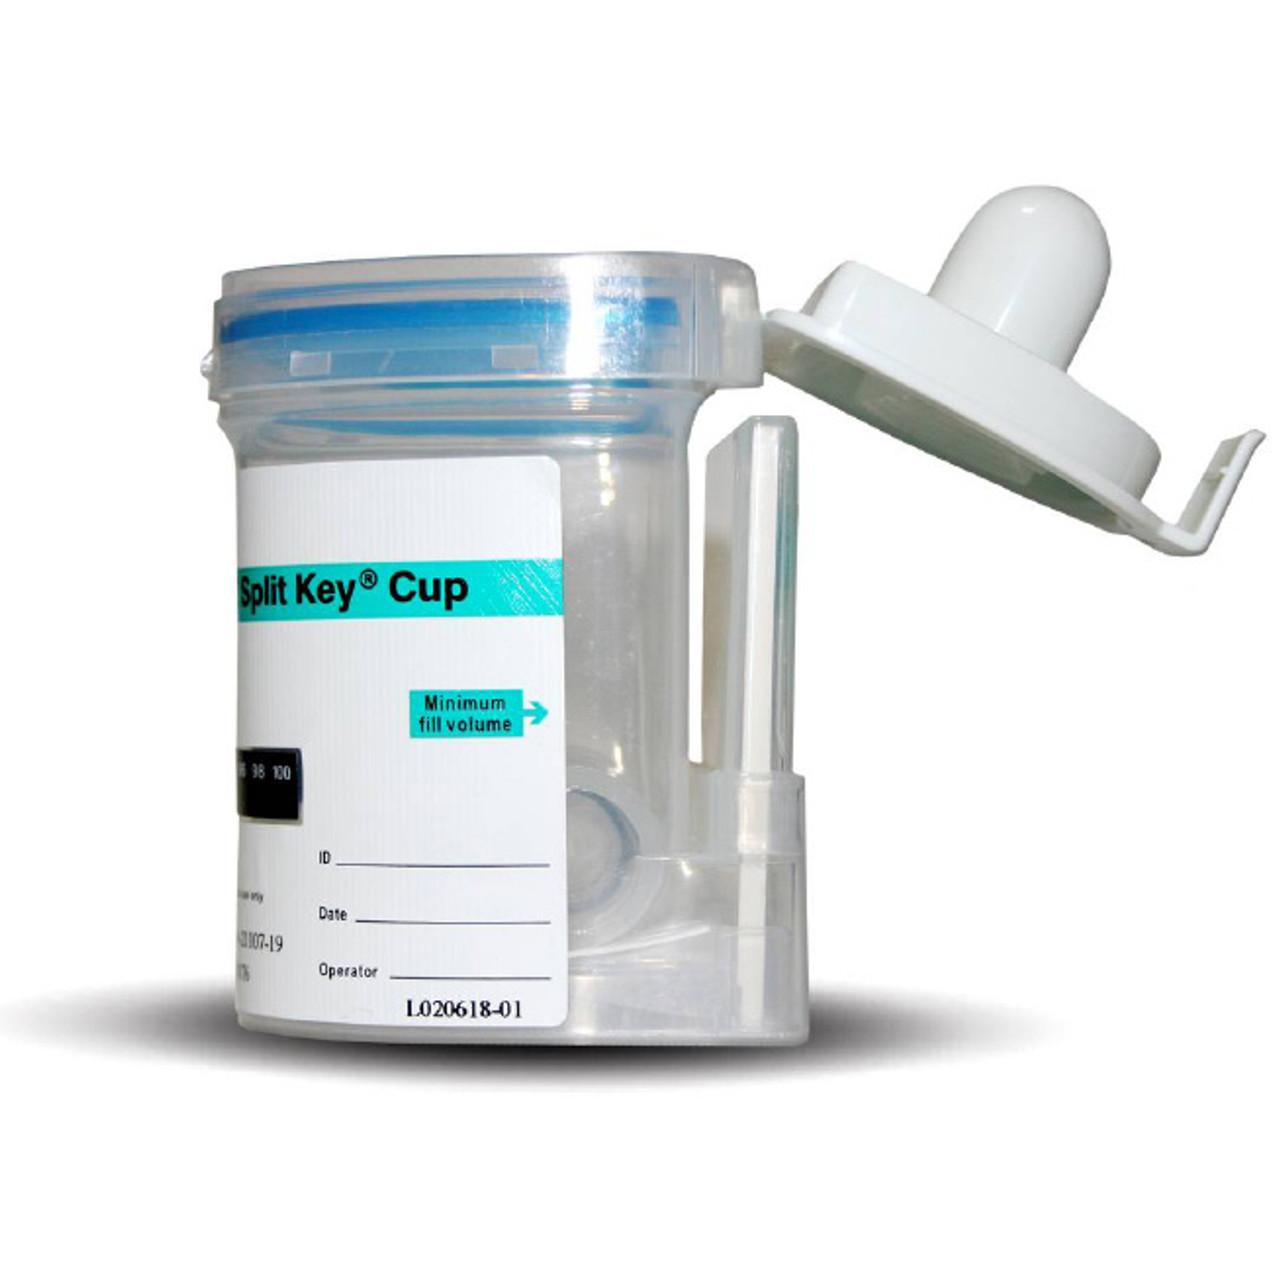 6 Panel E-Z Integrated Split Specimen Key Cup Drug Test 25/Box